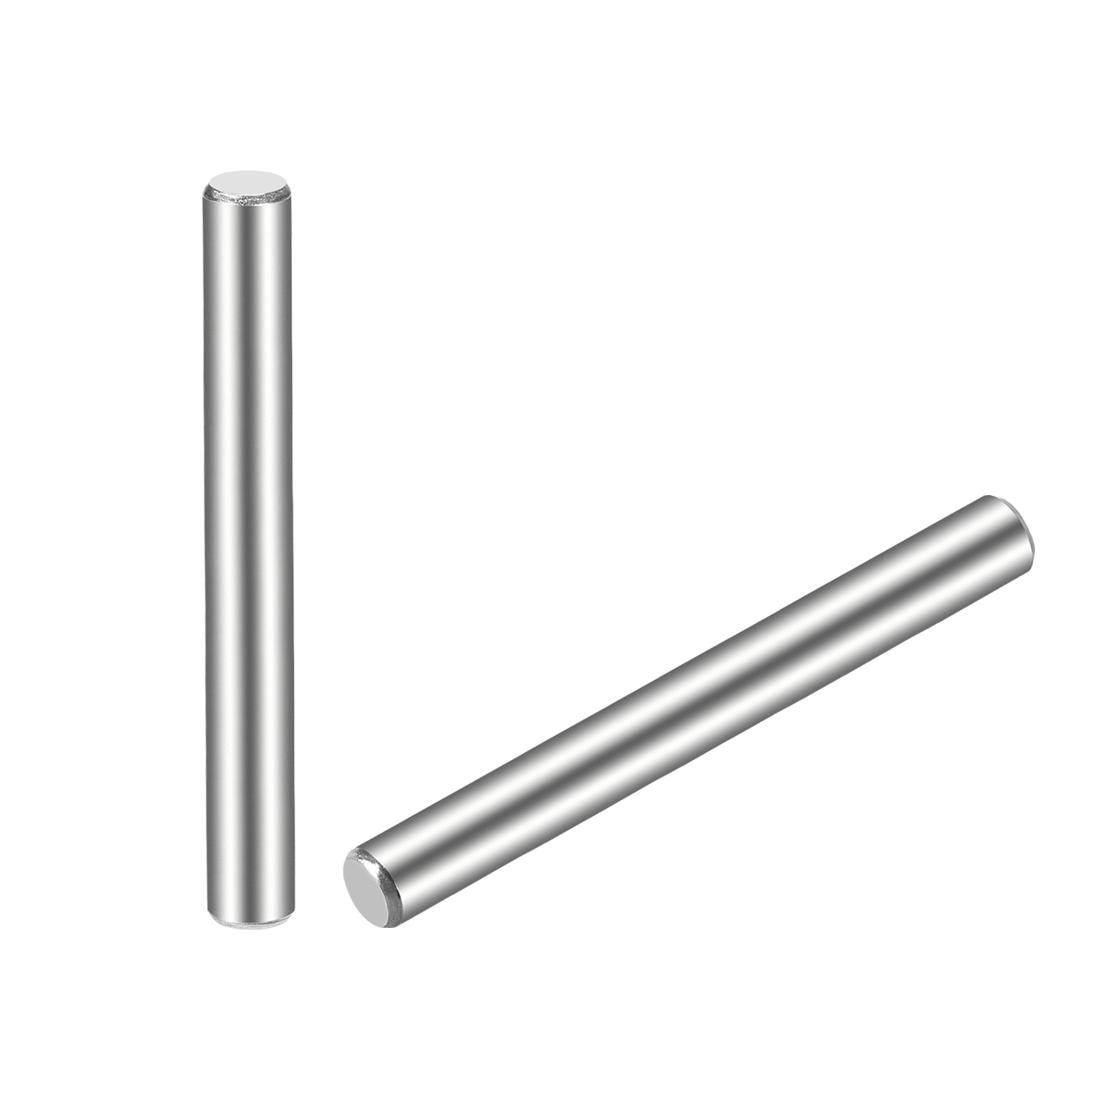 15Pcs 5mm x 80mm Dowel Pin 304 Stainless Steel Shelf Support Pin Fasten